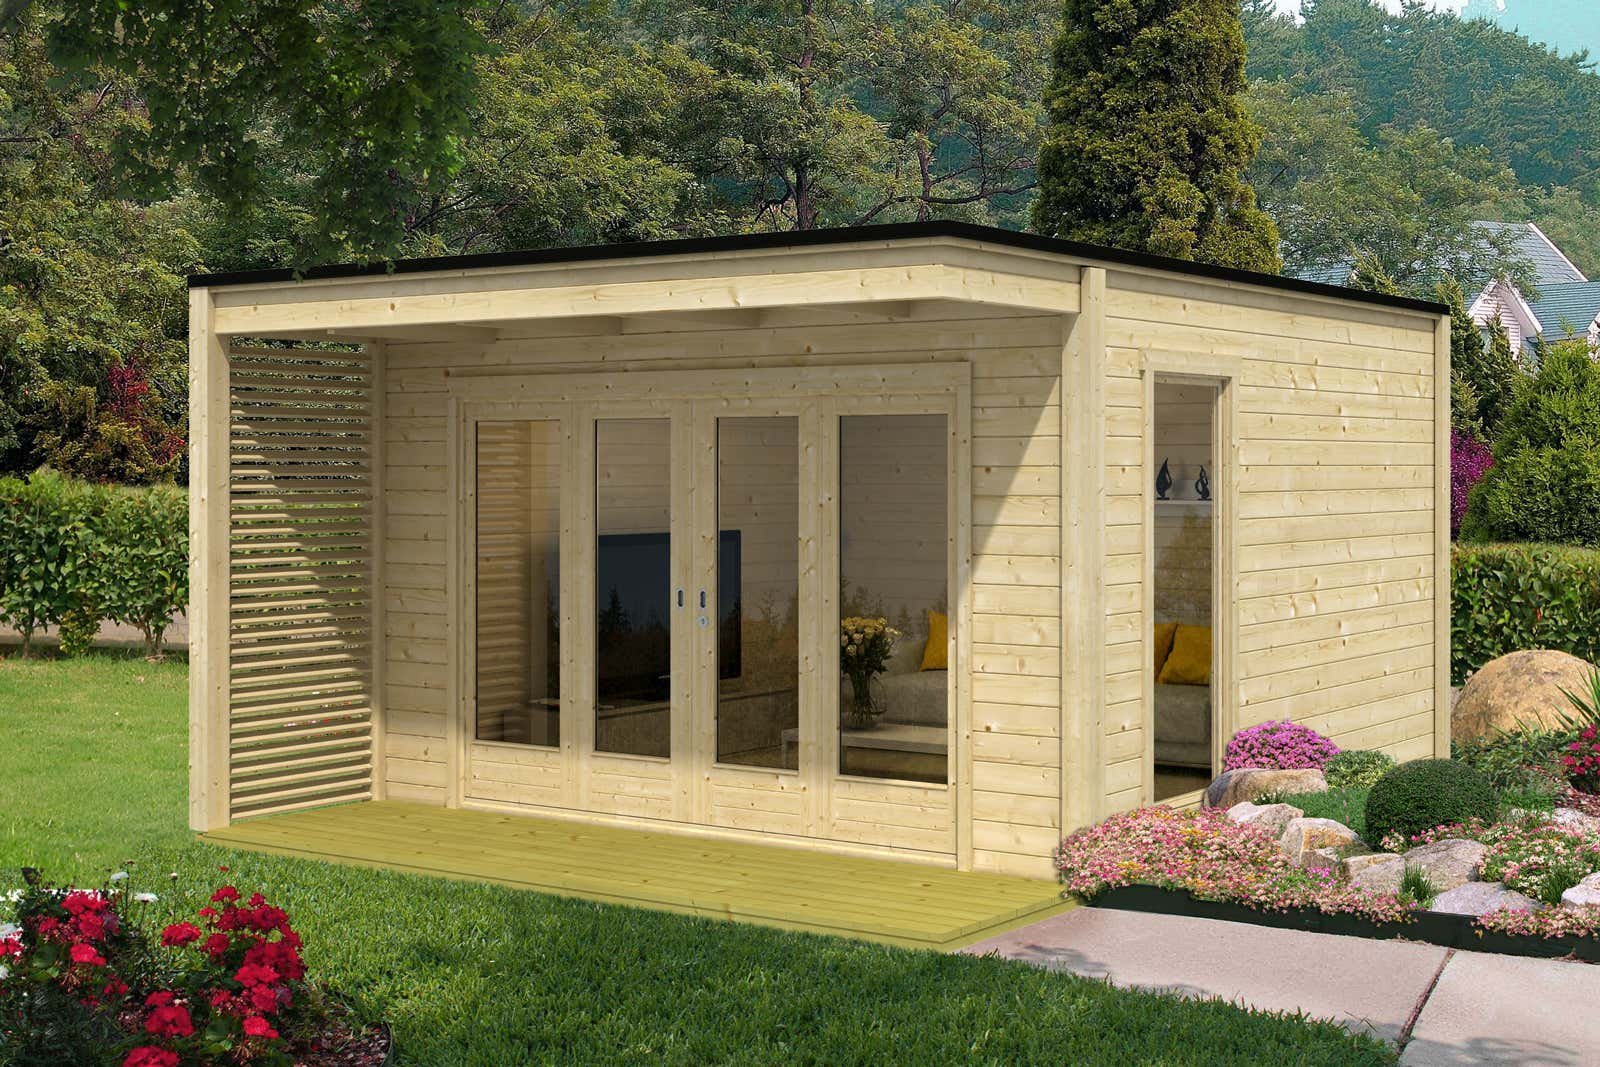 design gartenhaus cubus vio 40 a z gartenhaus gmbh. Black Bedroom Furniture Sets. Home Design Ideas